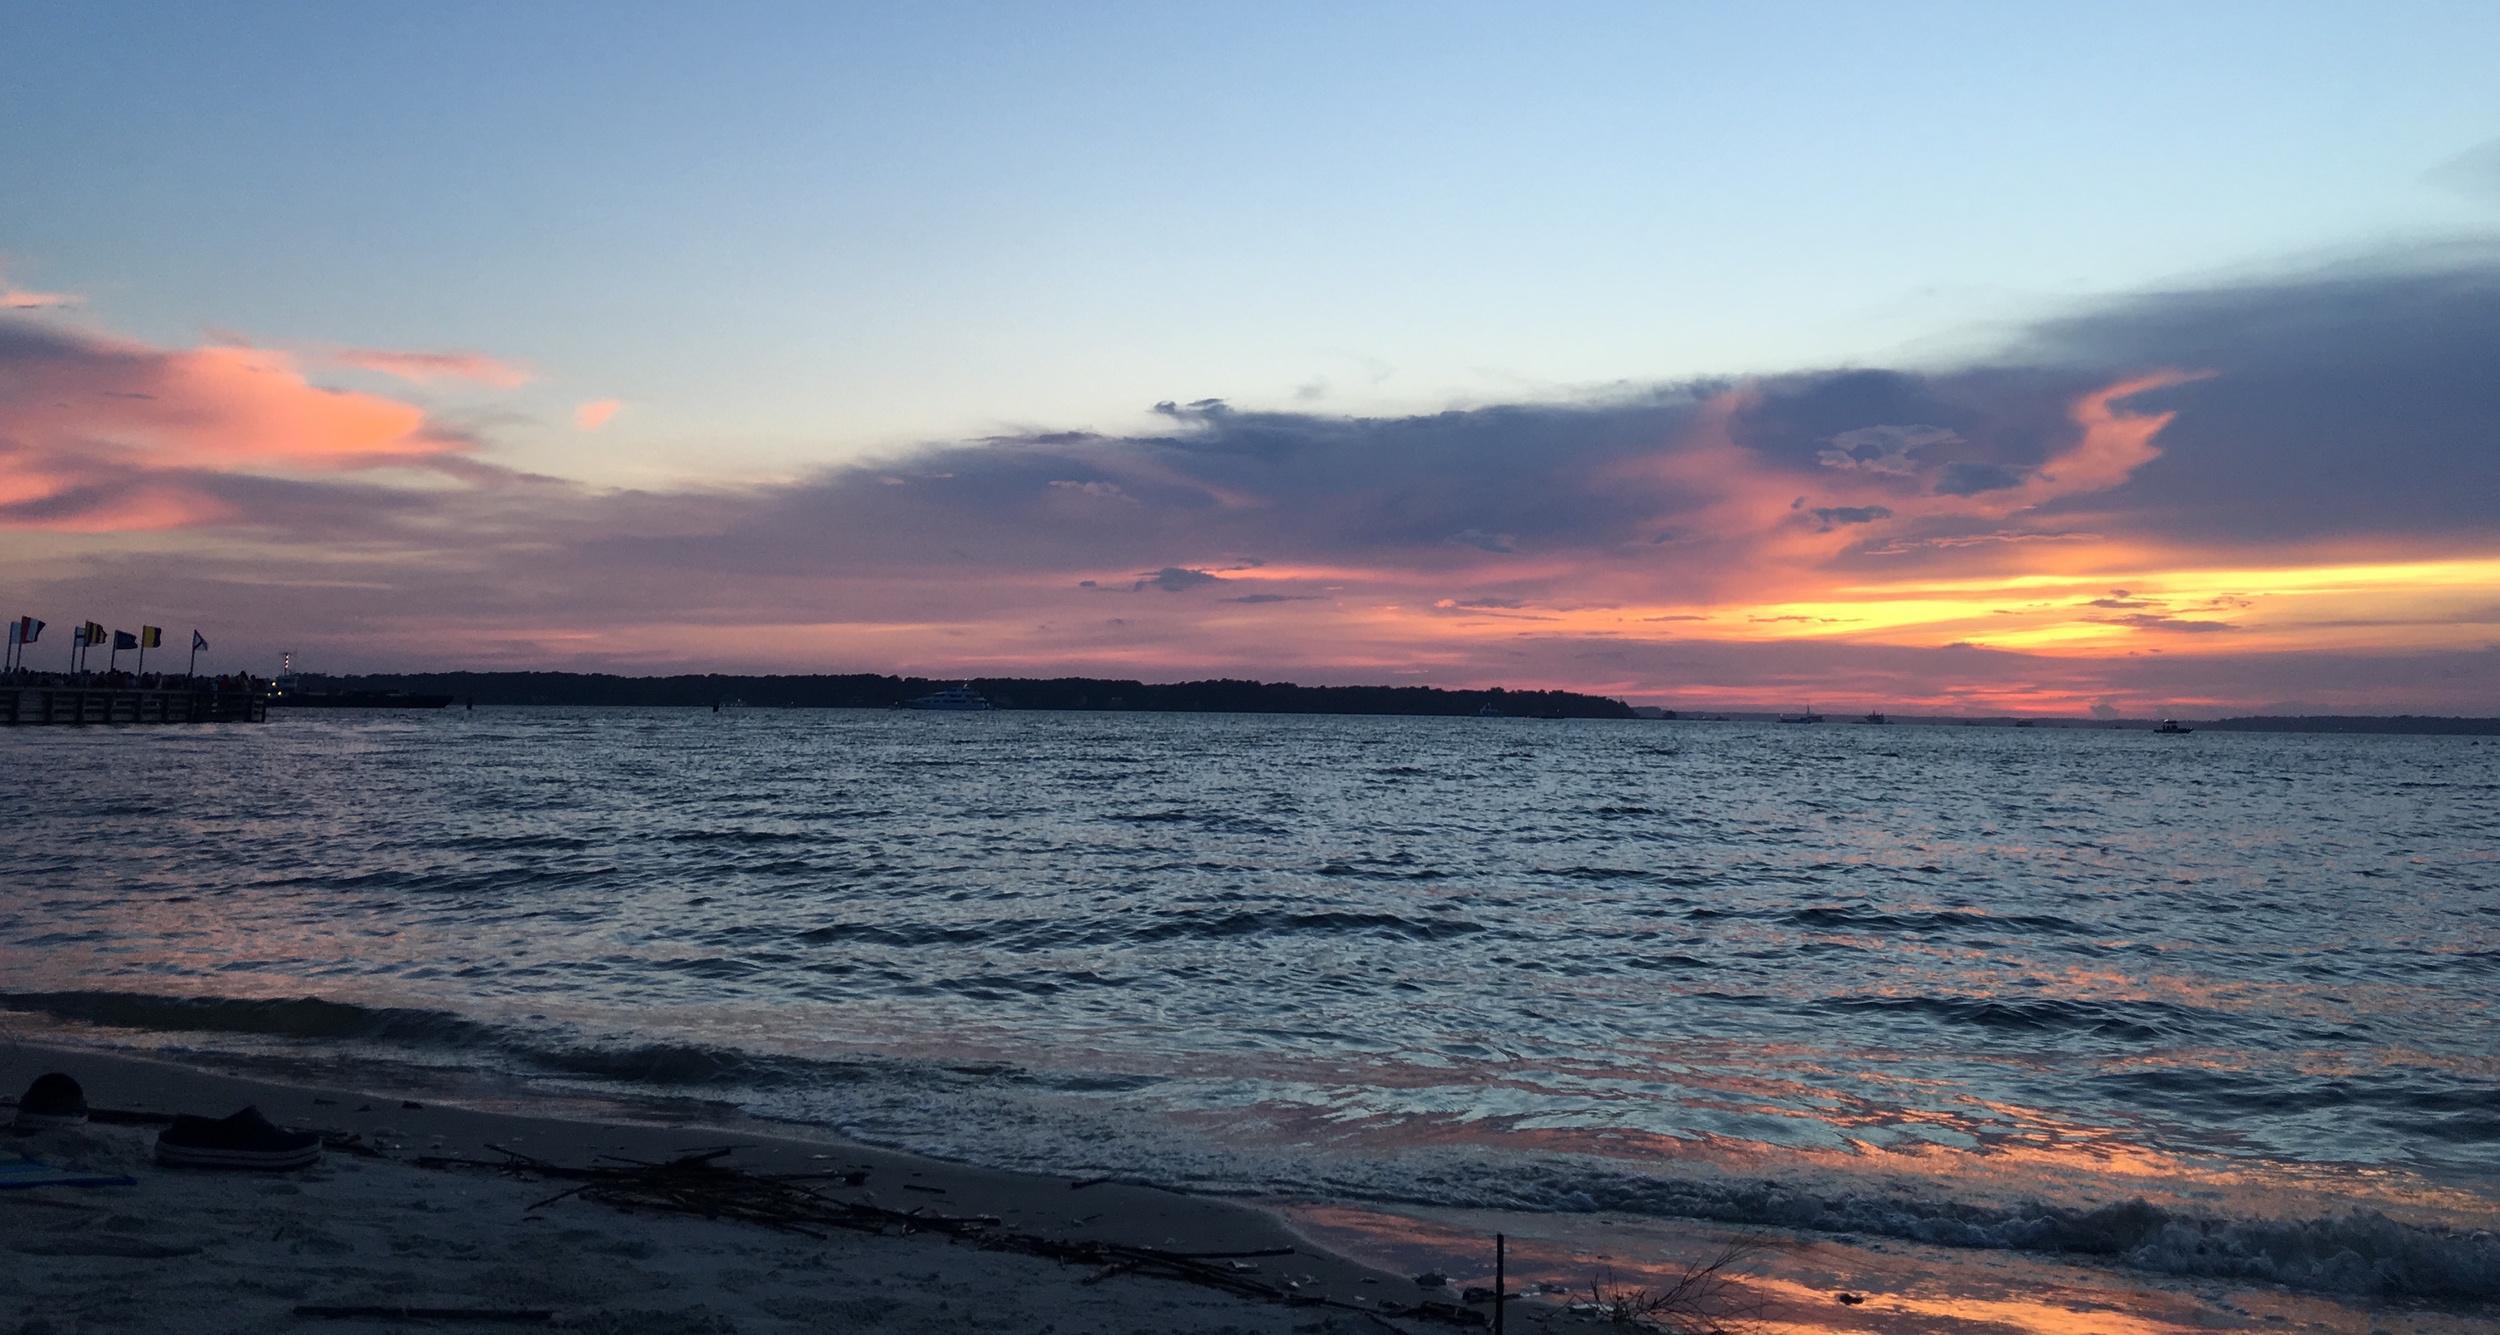 4th of July Hilton Head sunset